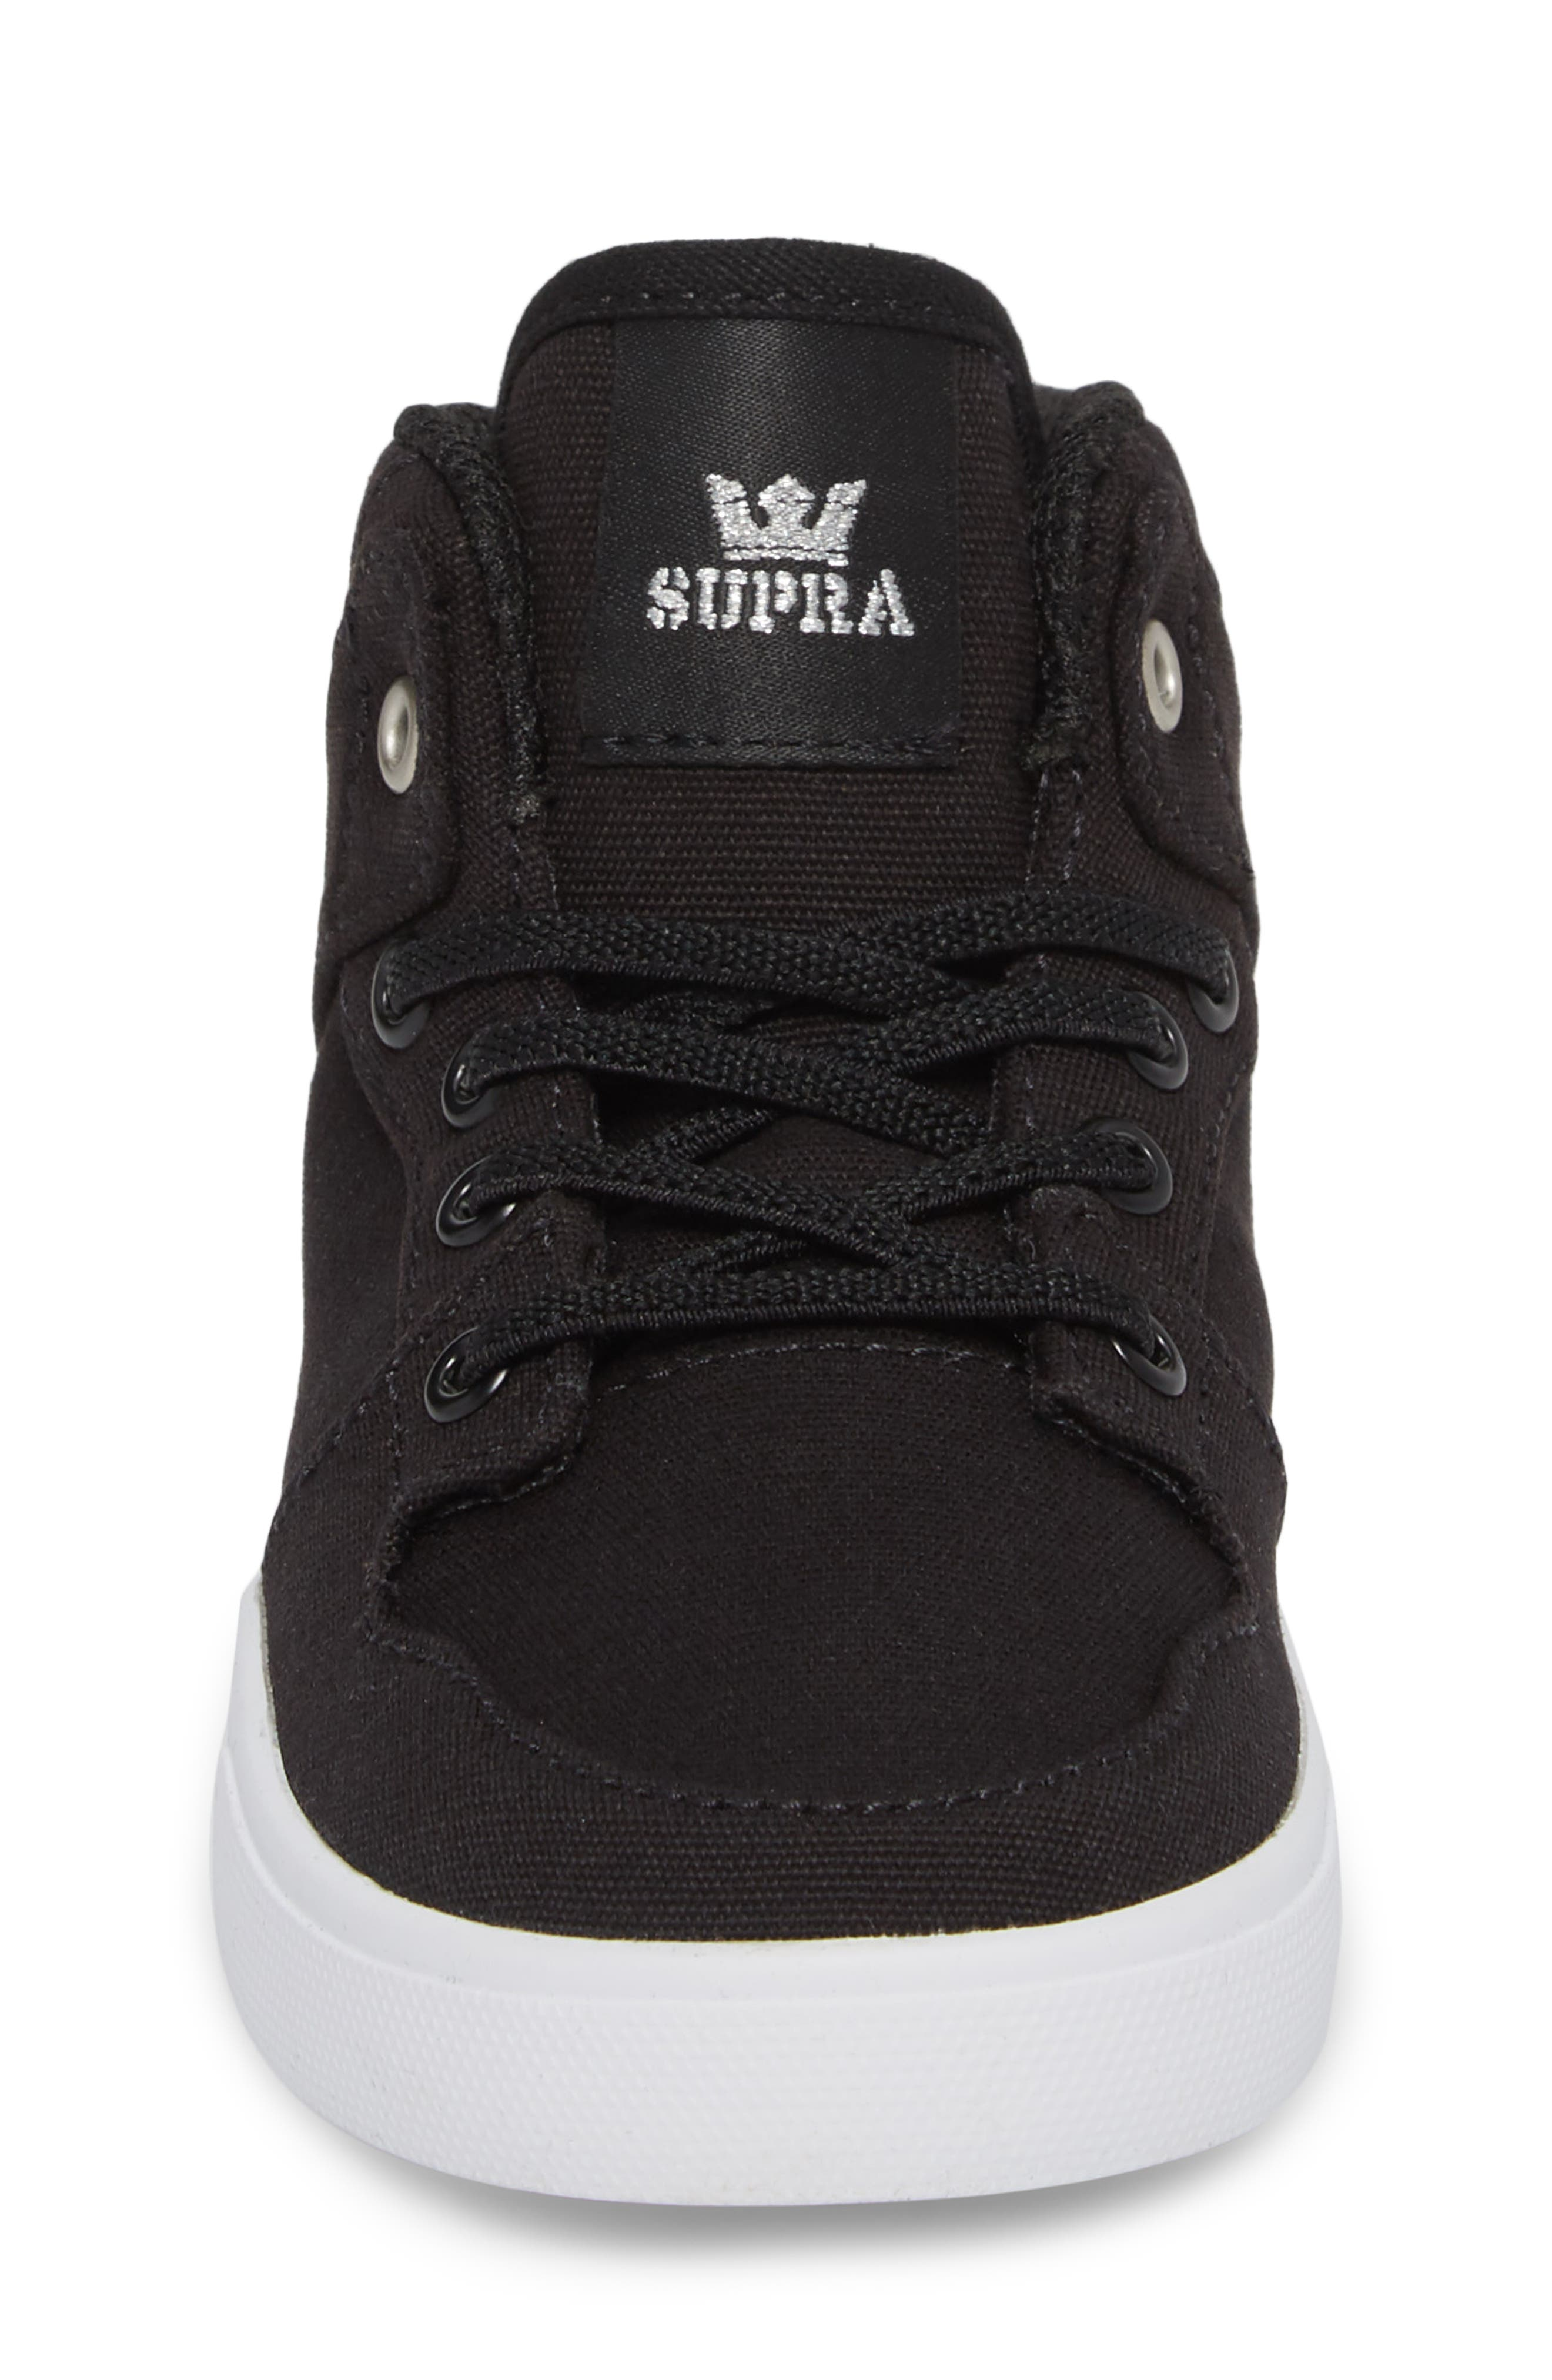 'Vaider' High Top Sneaker,                             Alternate thumbnail 4, color,                             Black/ White